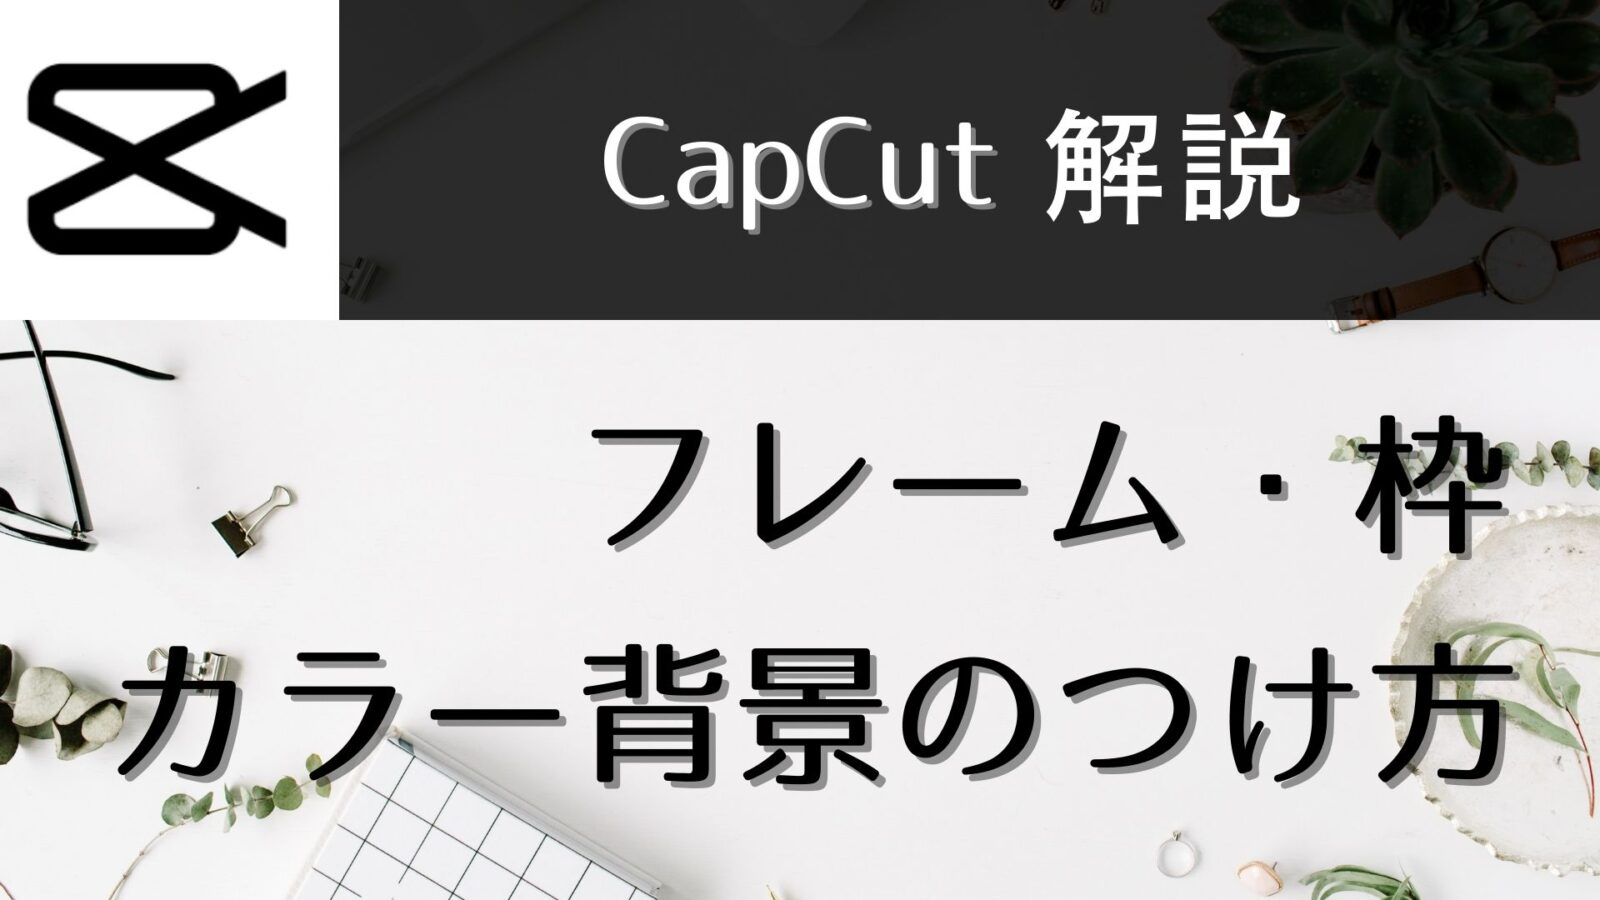 【CapCut】動画におしゃれなフレーム枠・カラー背景をつける方法5選